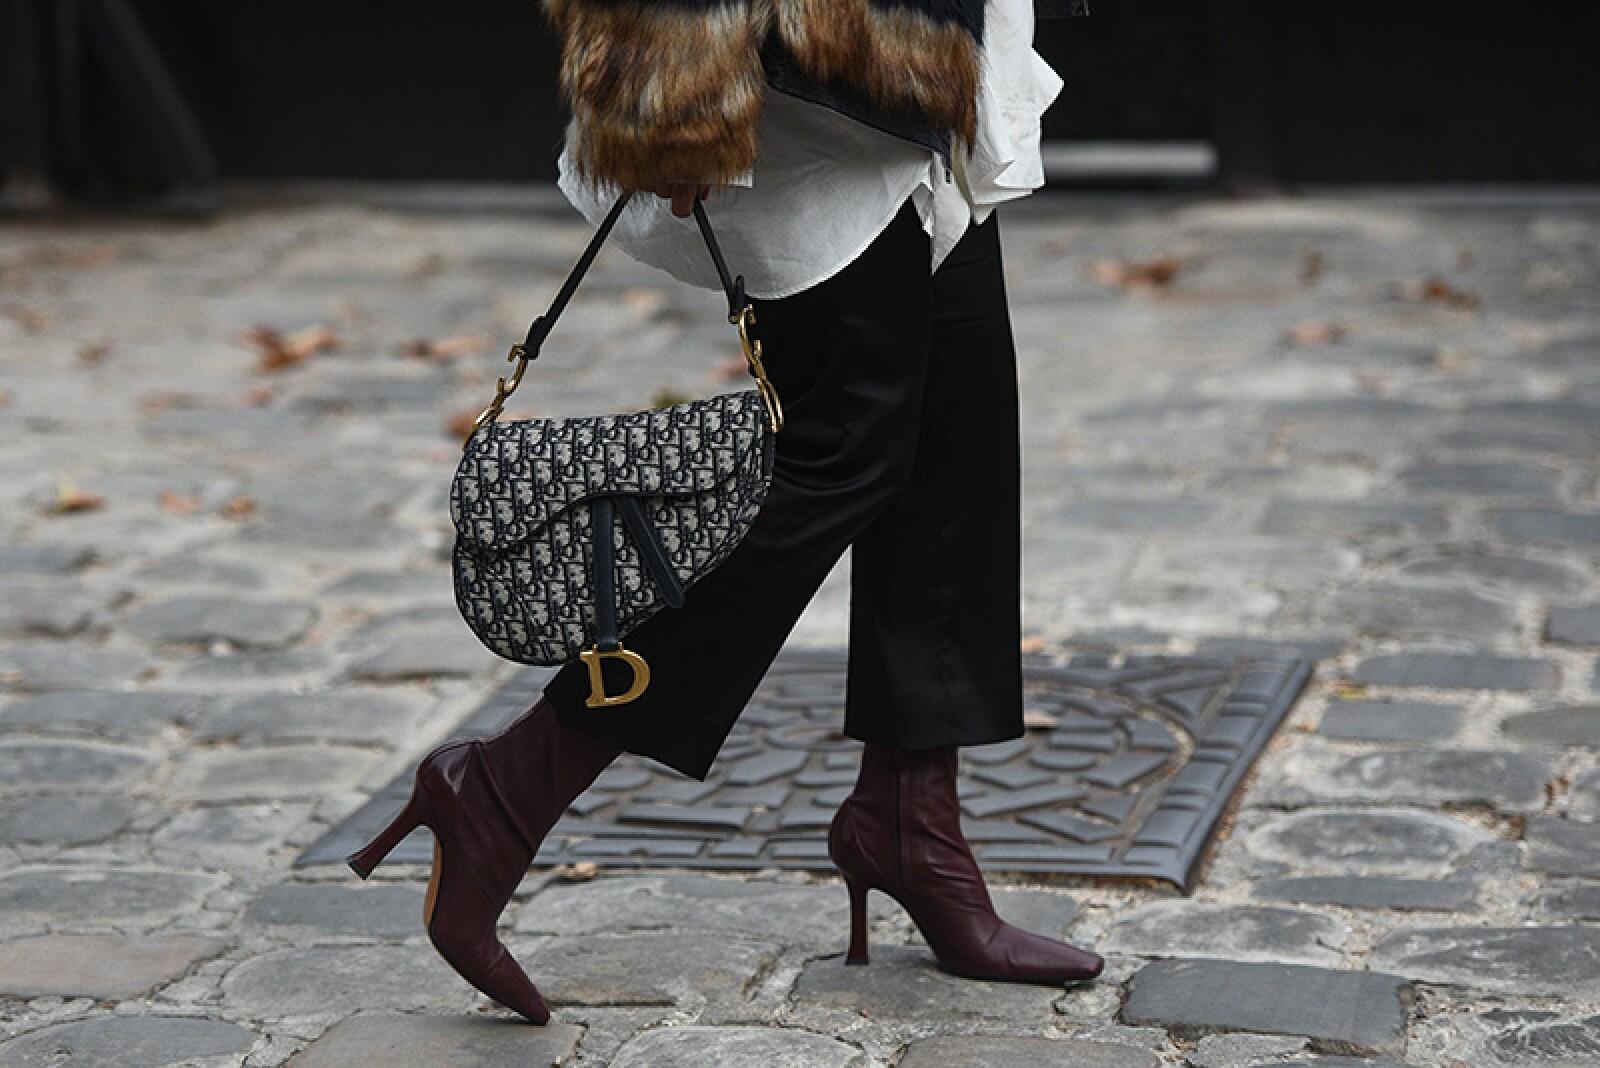 Street Style, Spring Summer 2019, Paris Fashion Week, France - 30 Sep 2018